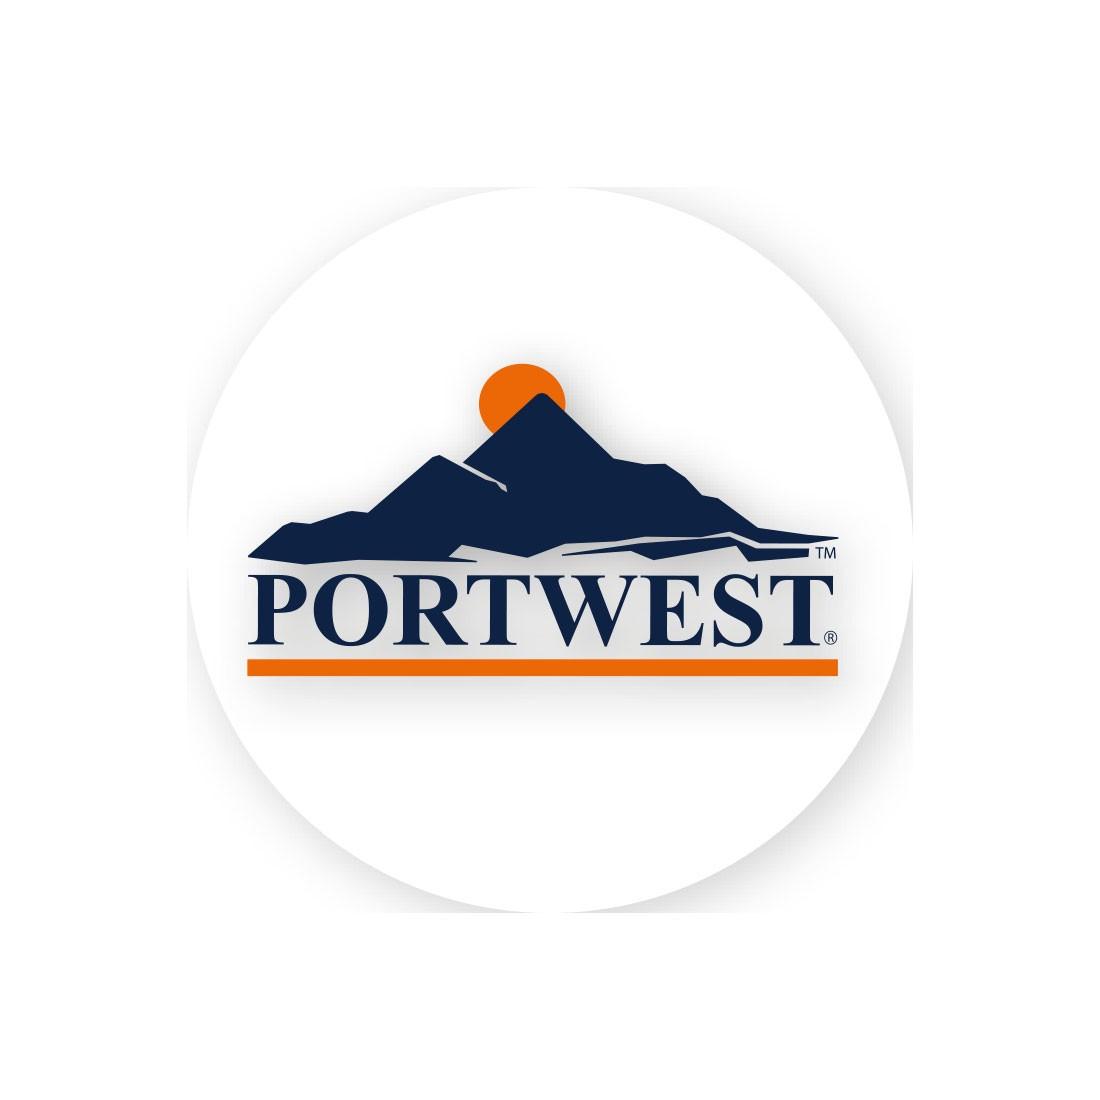 Portwest Coaster